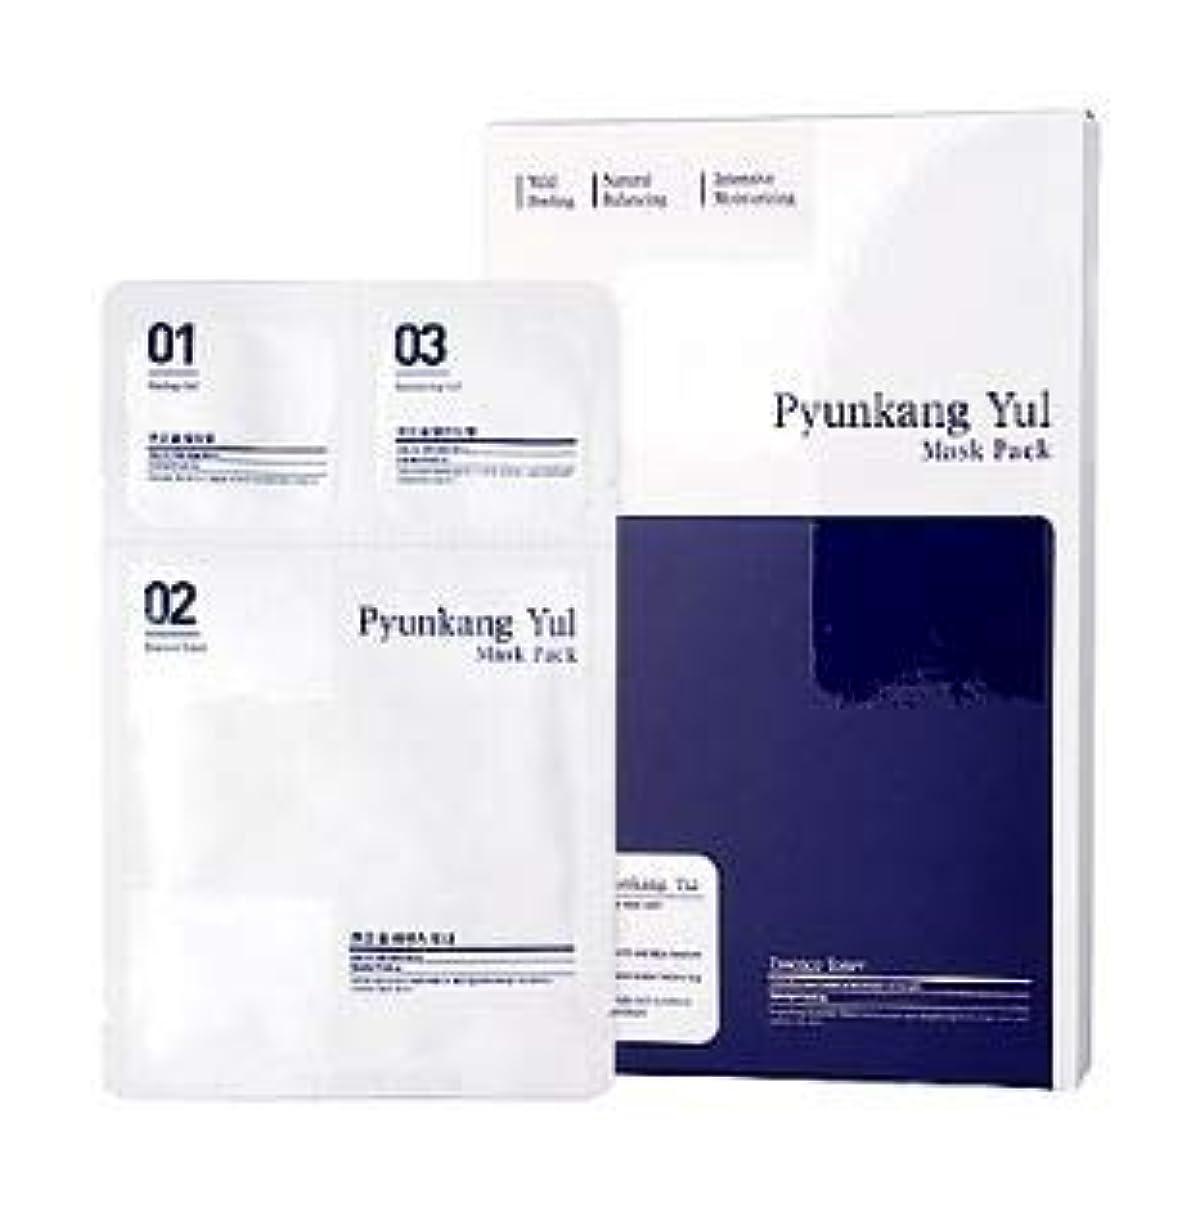 [Pyunkang Yul] 3 Step Mask Pack (5ea) /[扁康率(PYUNKANG YUL)] 3 ステップ マスク パック (5枚) [並行輸入品]